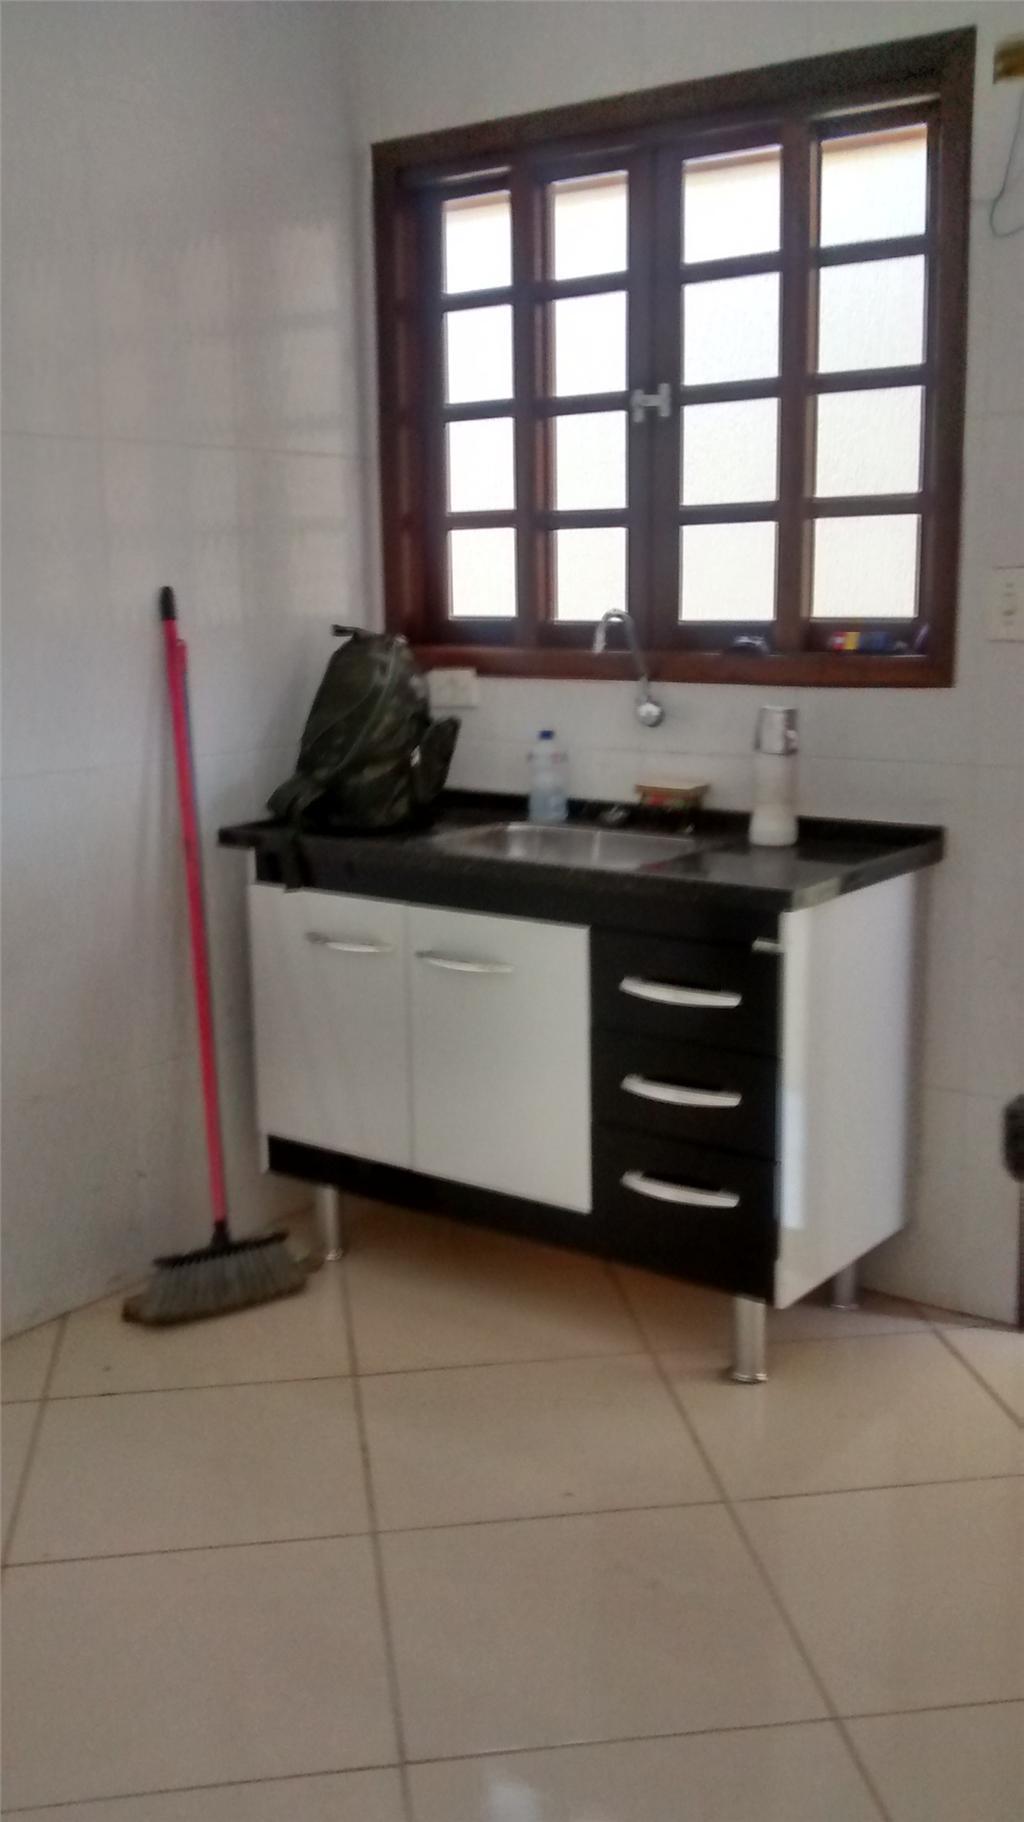 Casa 2 Dorm, Jardim Adriana, Guarulhos (CA0303) - Foto 2